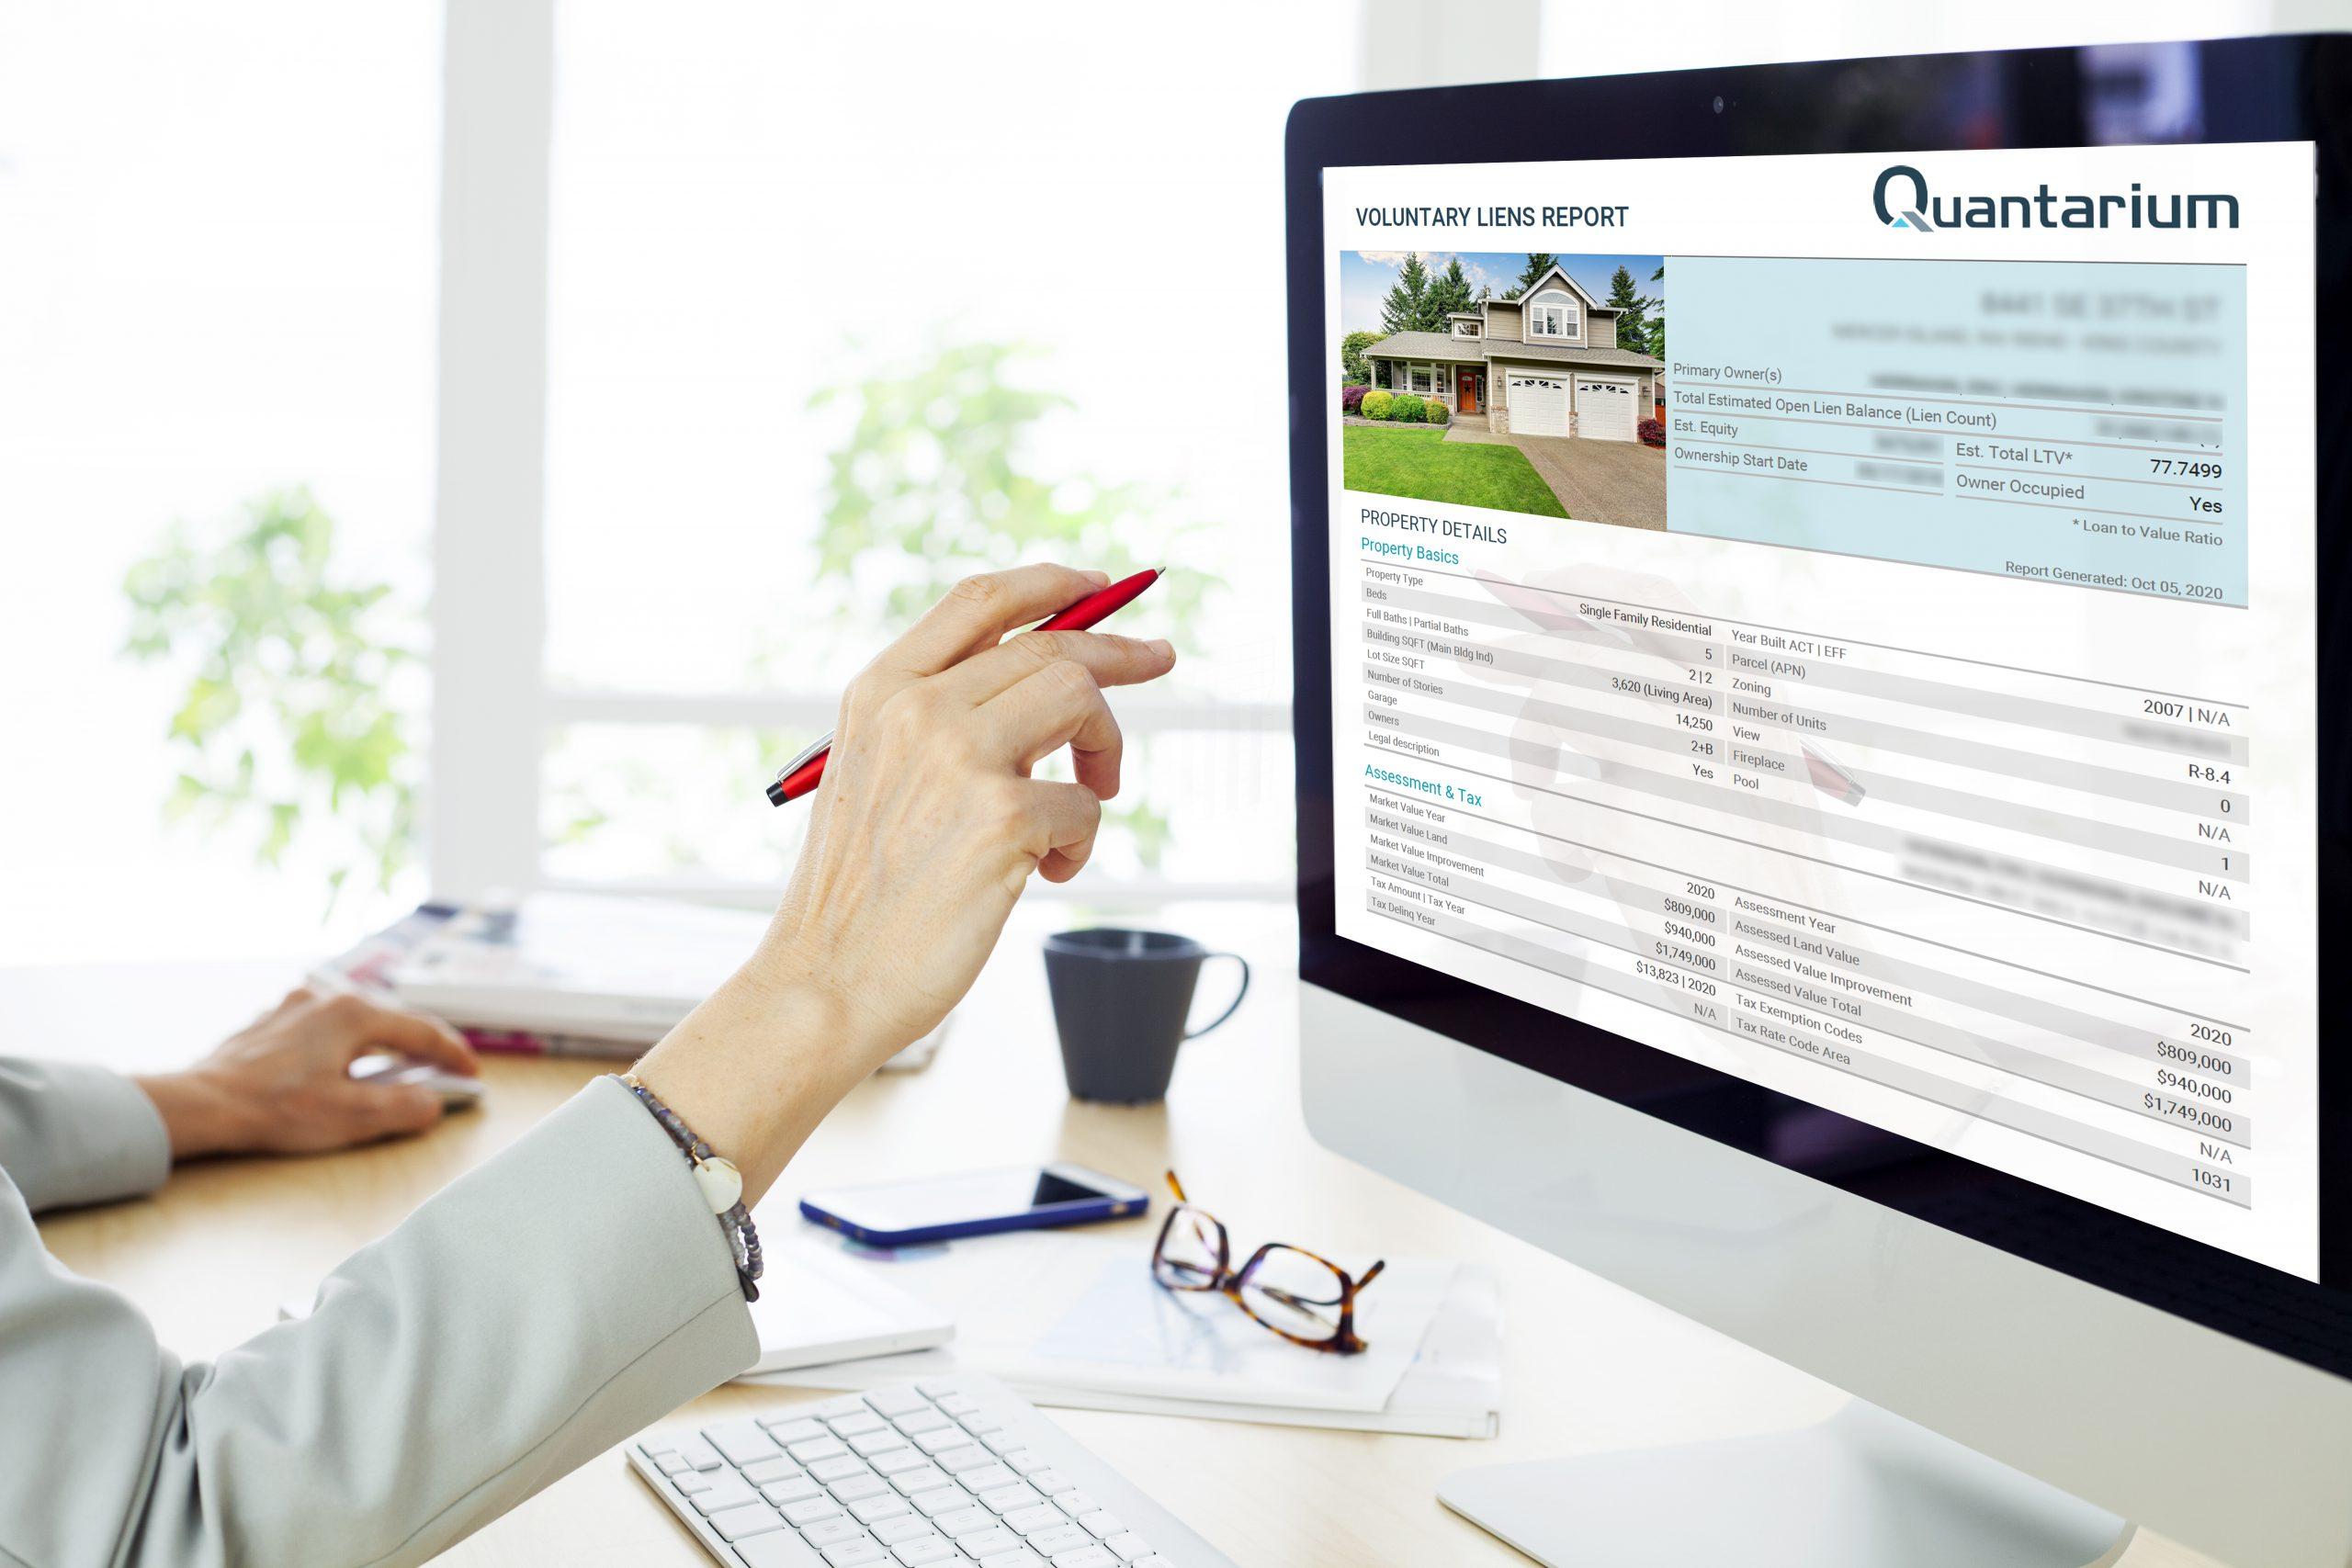 Quantarium Data and Search Platform Voluntary Liens Report